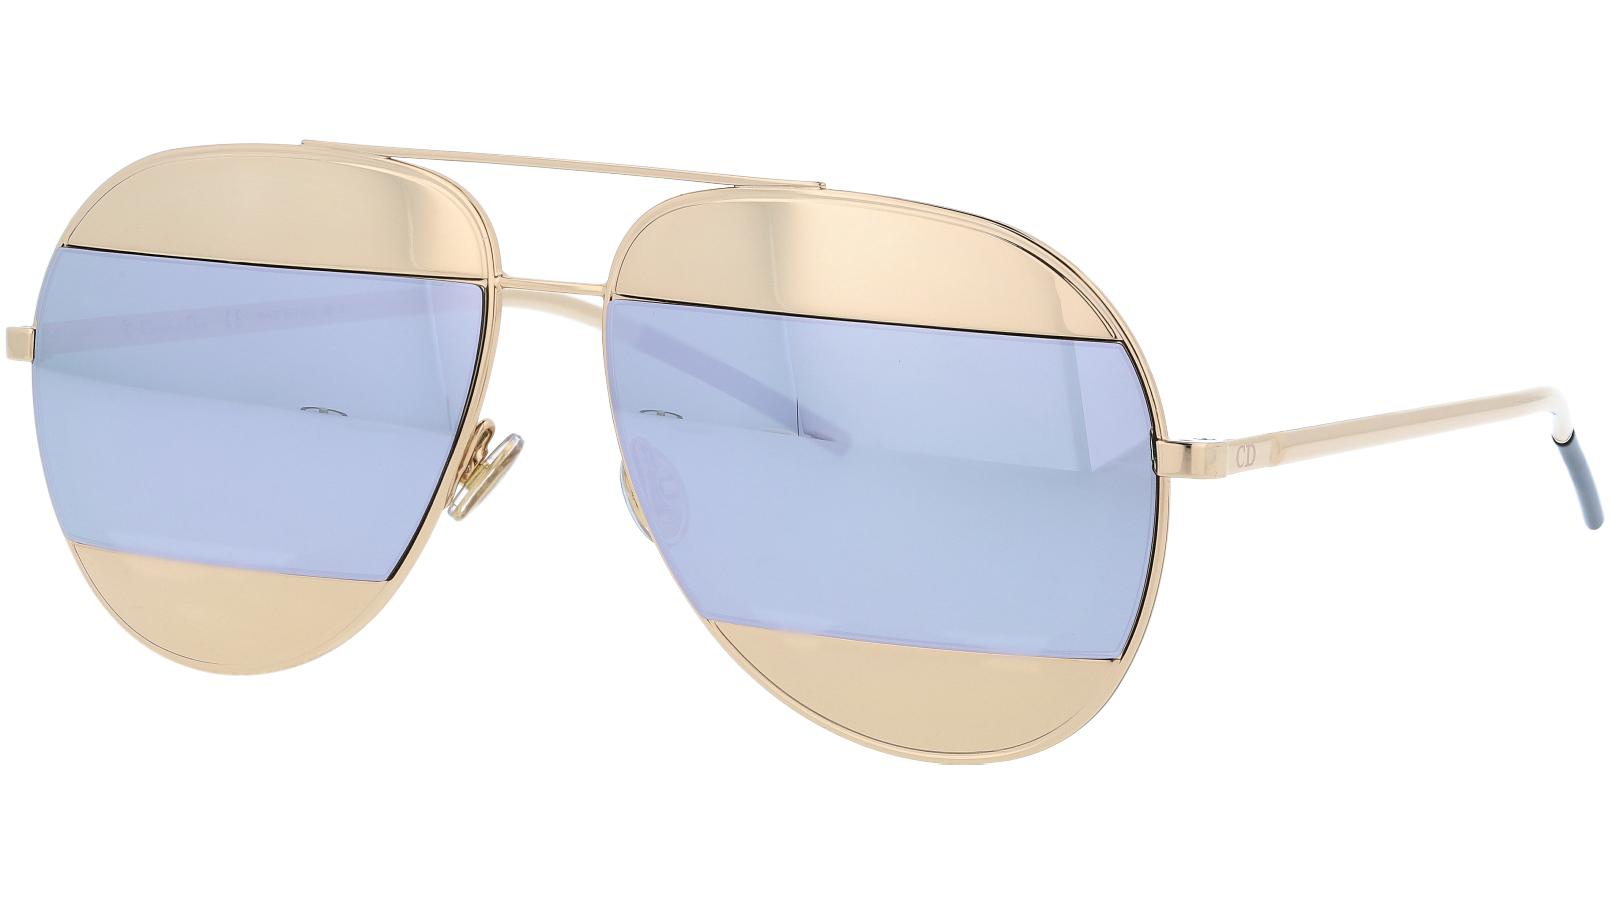 DIOR DIORSPLIT1 000DC 59 ROSE Sunglasses